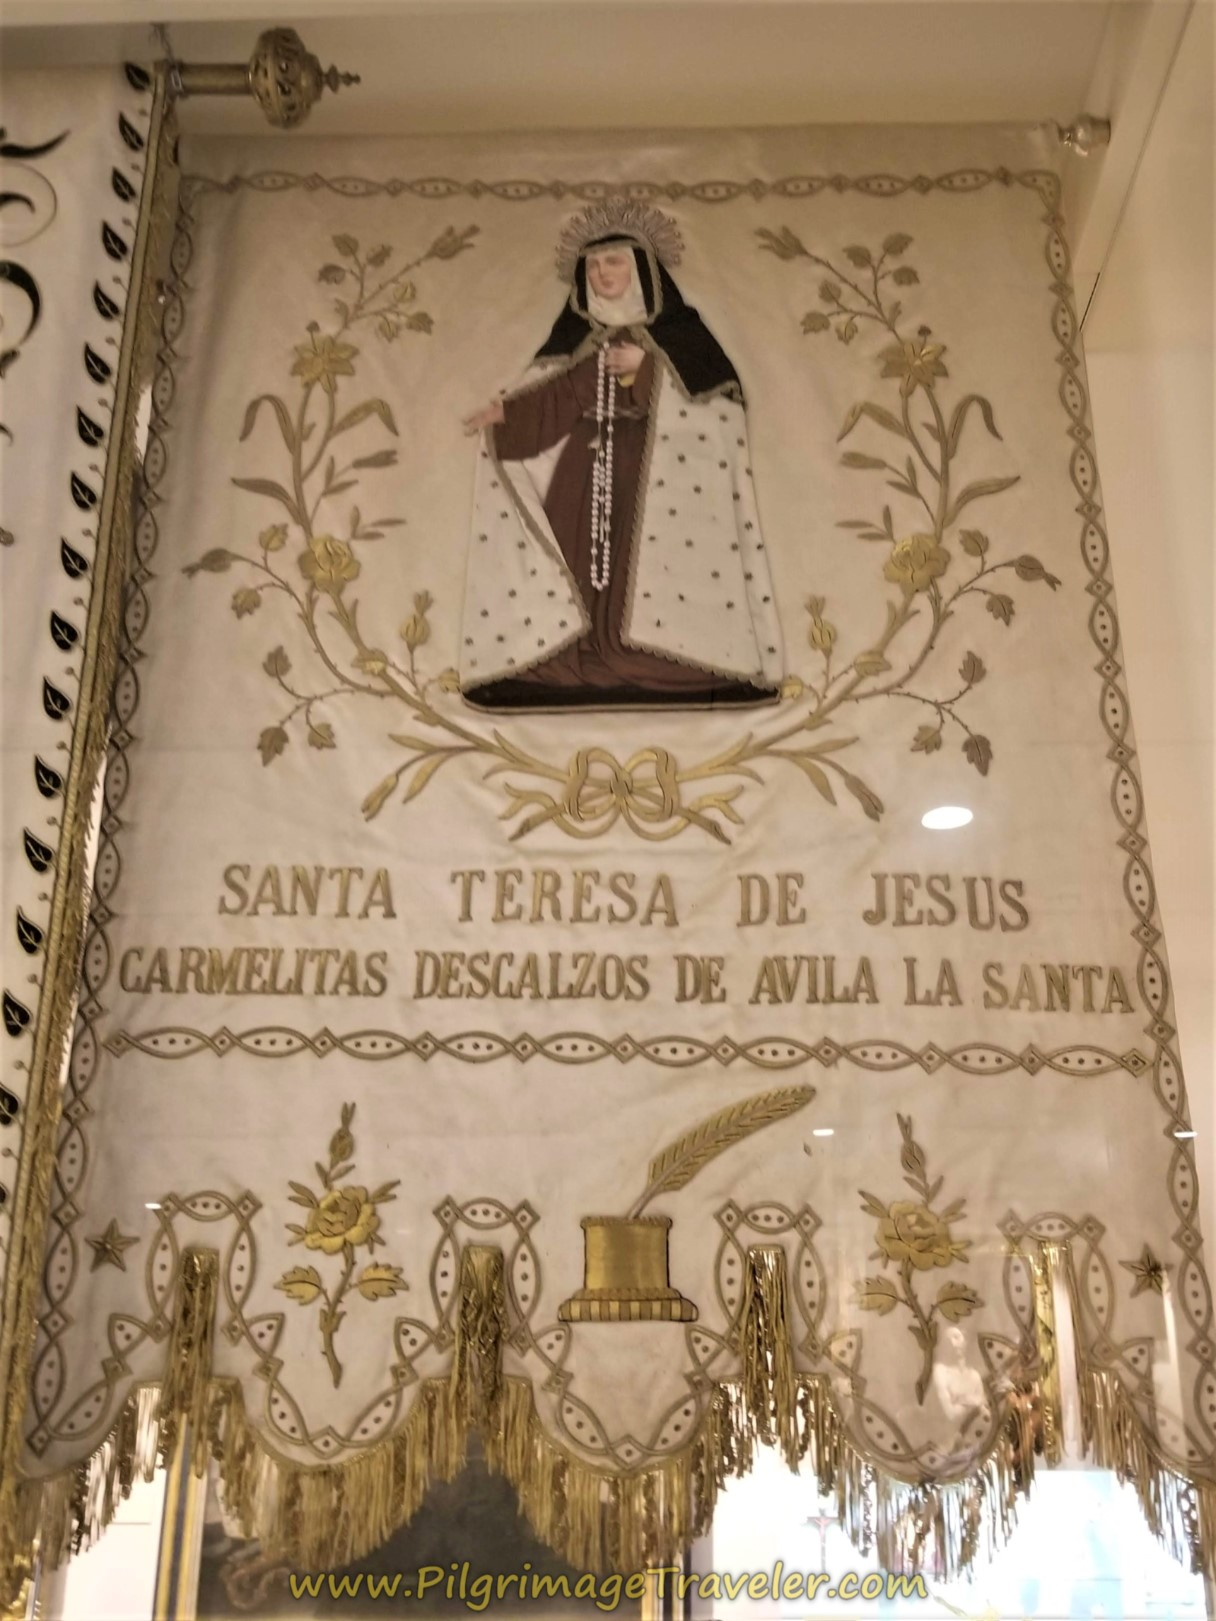 St. Teresa Tapestry, Museo Carmelitano